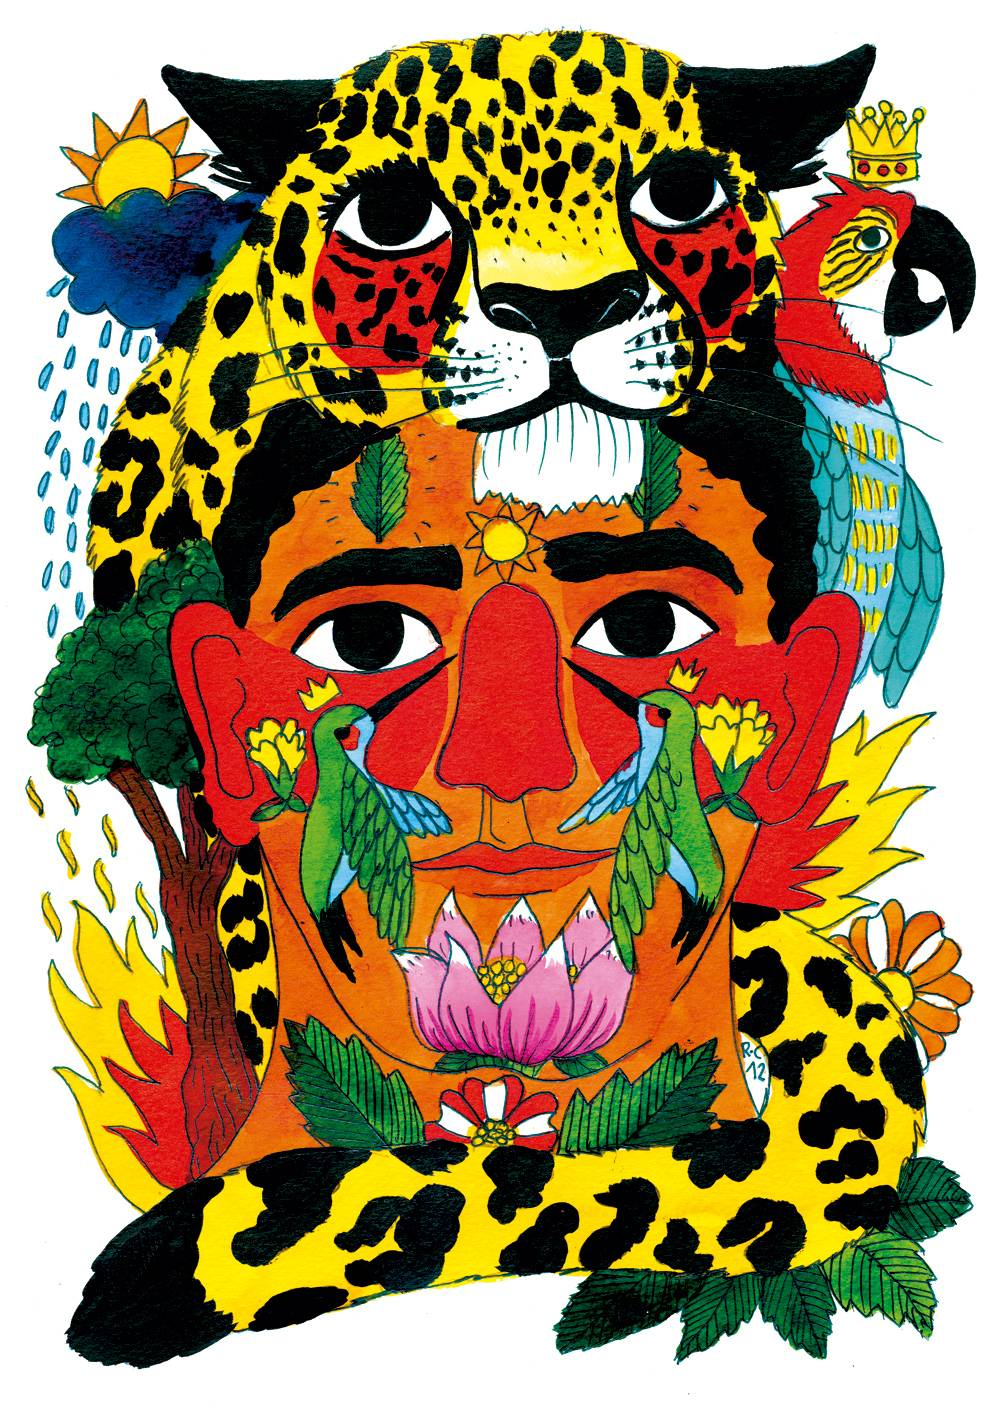 Jaguars by Ricardo Cavolo